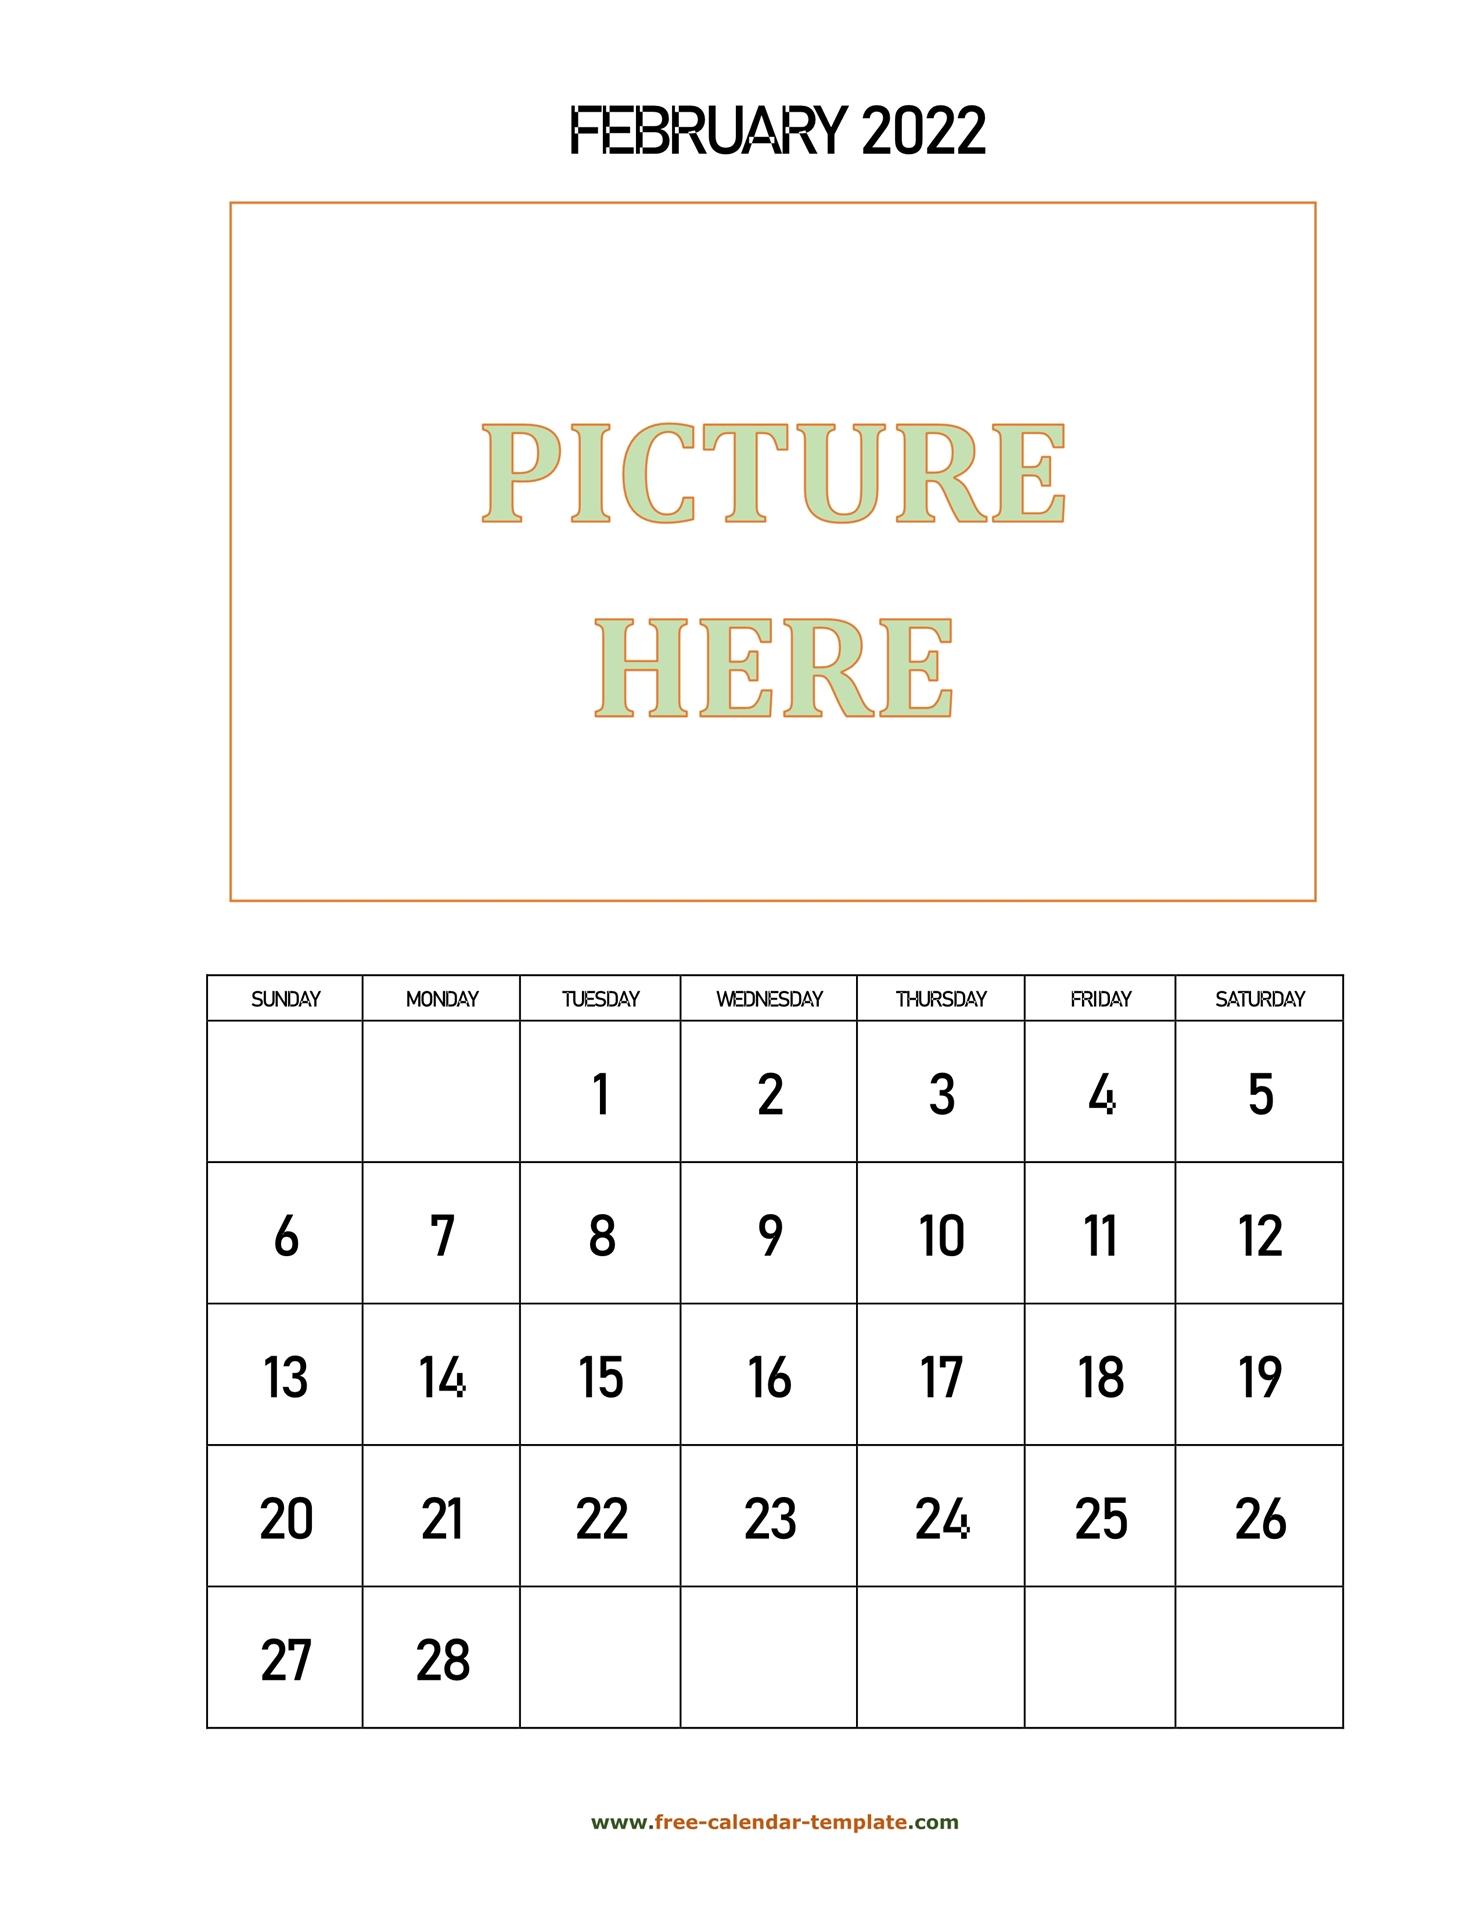 February Printable 2022 Calendar, Space For Add Picture In Calendar Print Feb 2022